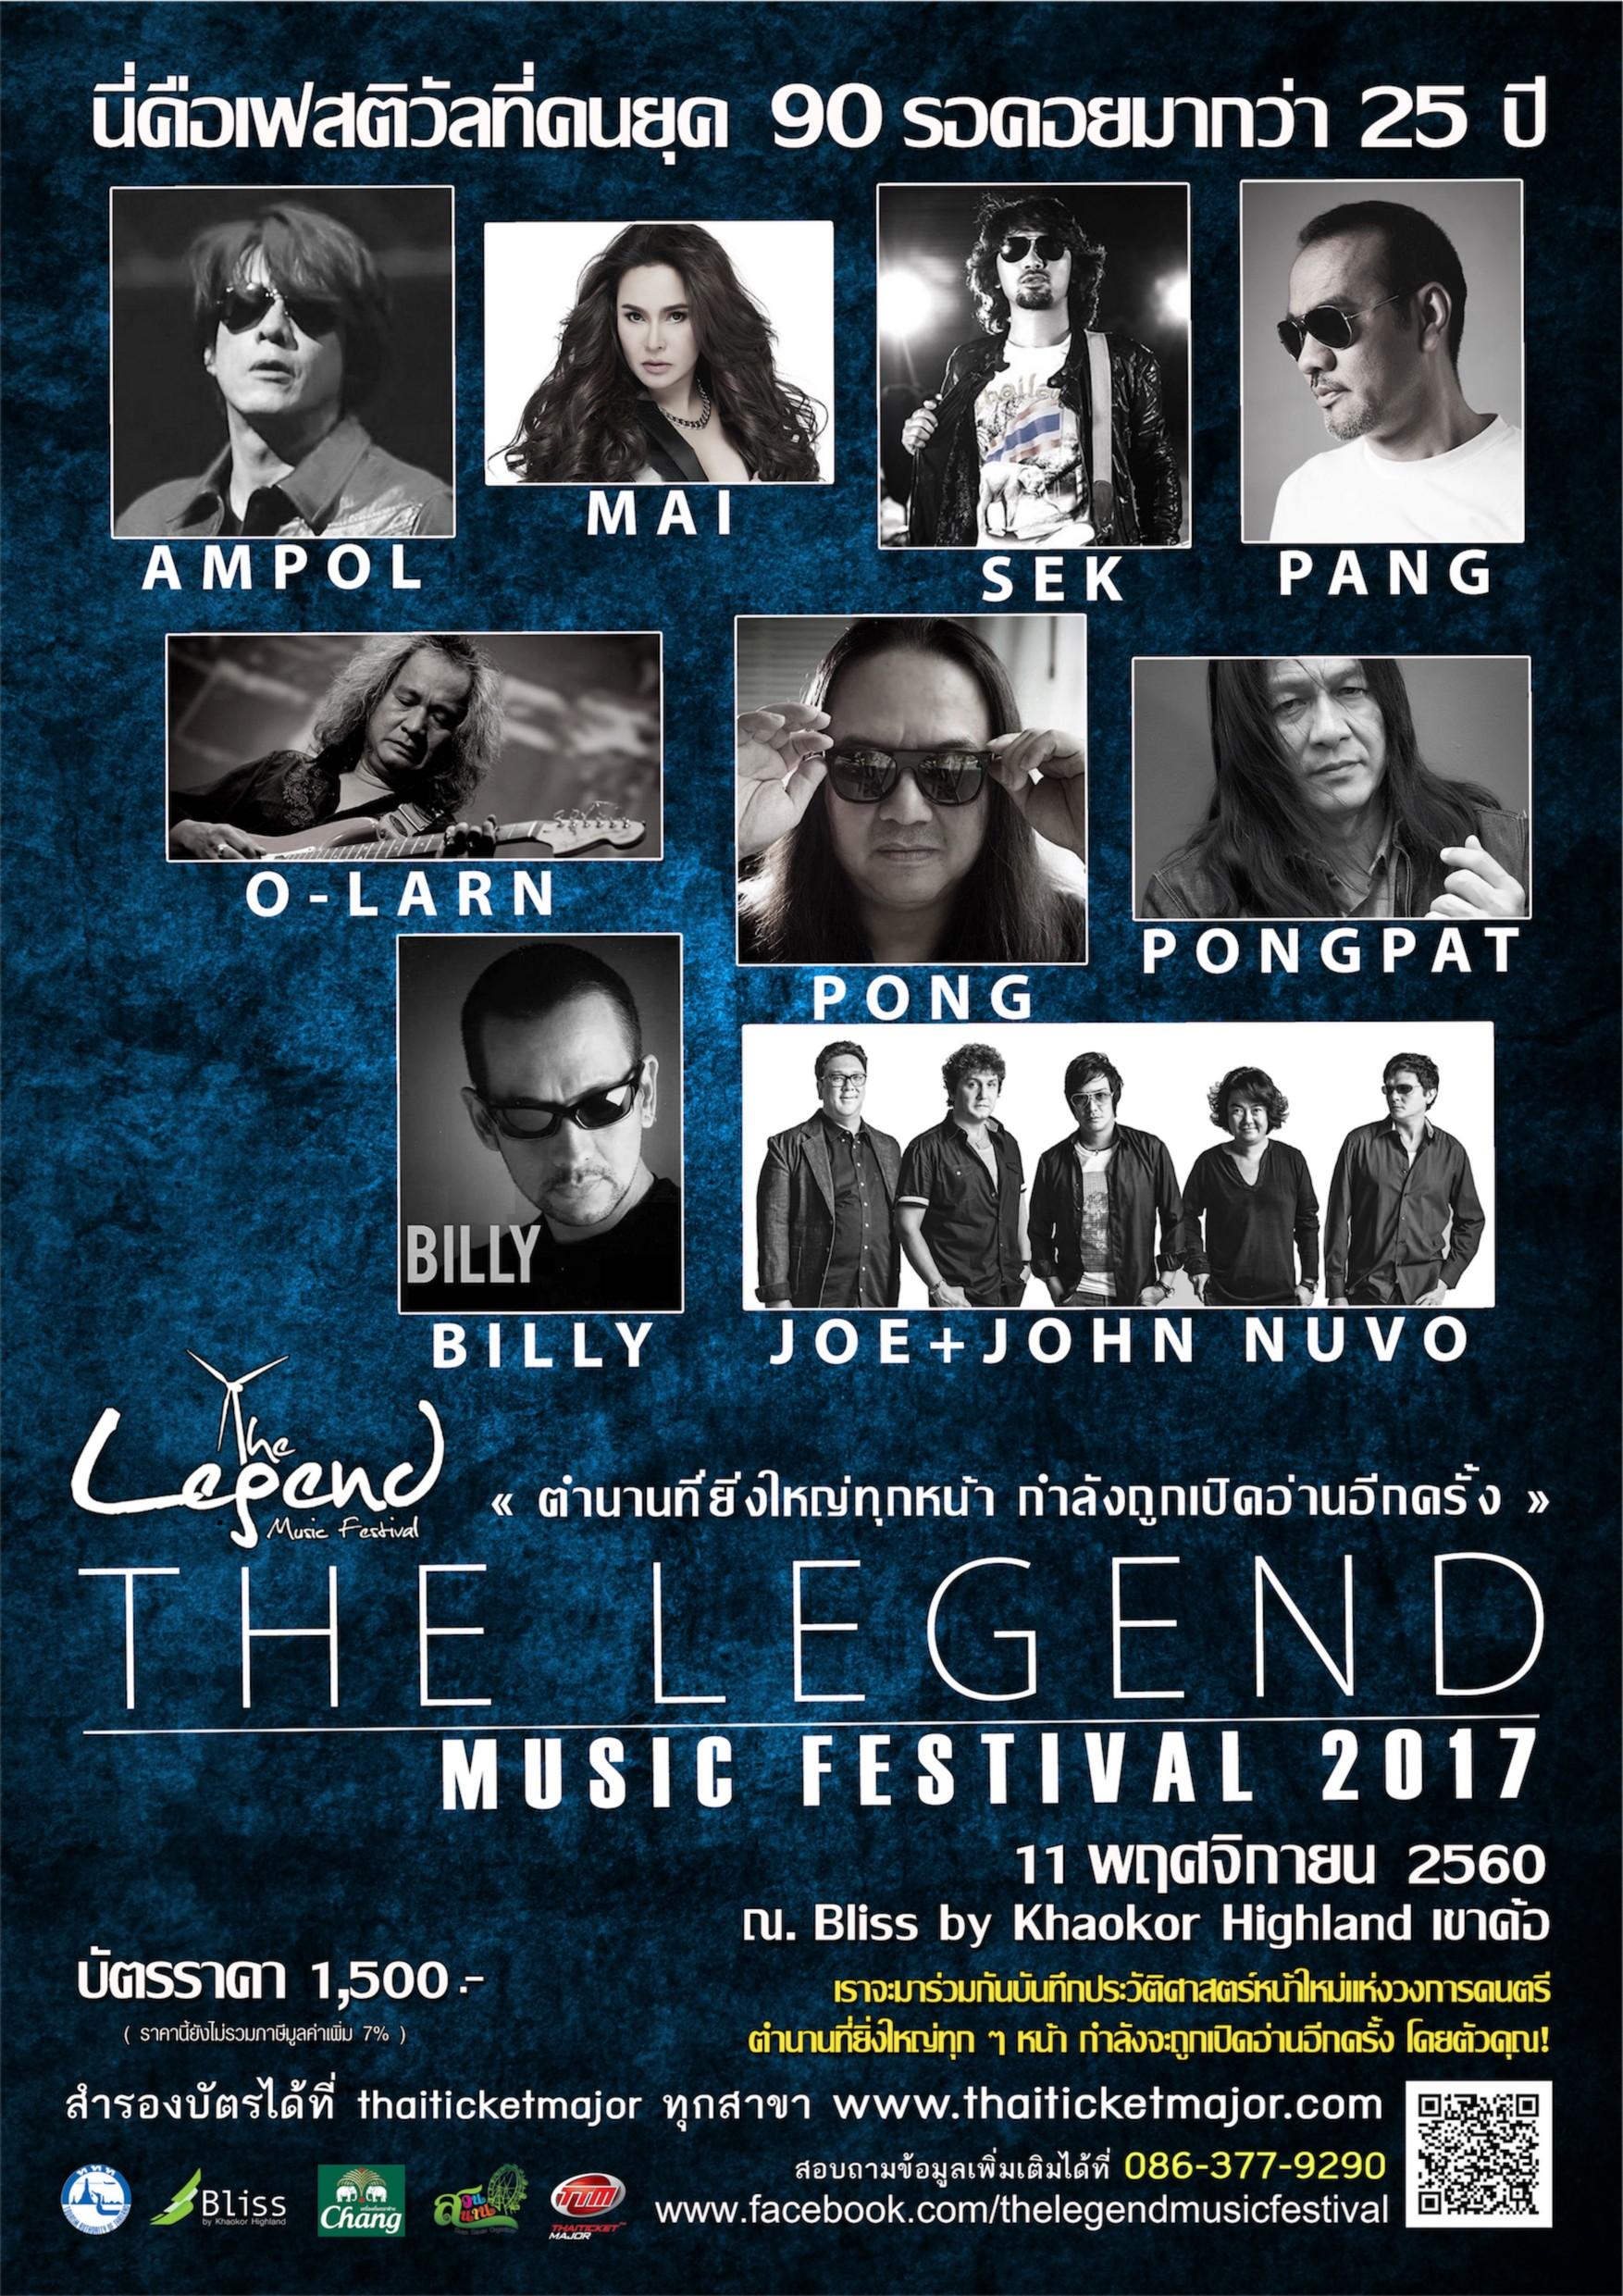 THE LEGEND MUSIC FESTIVAL เทศกาลดนตรีระดับตำนาน